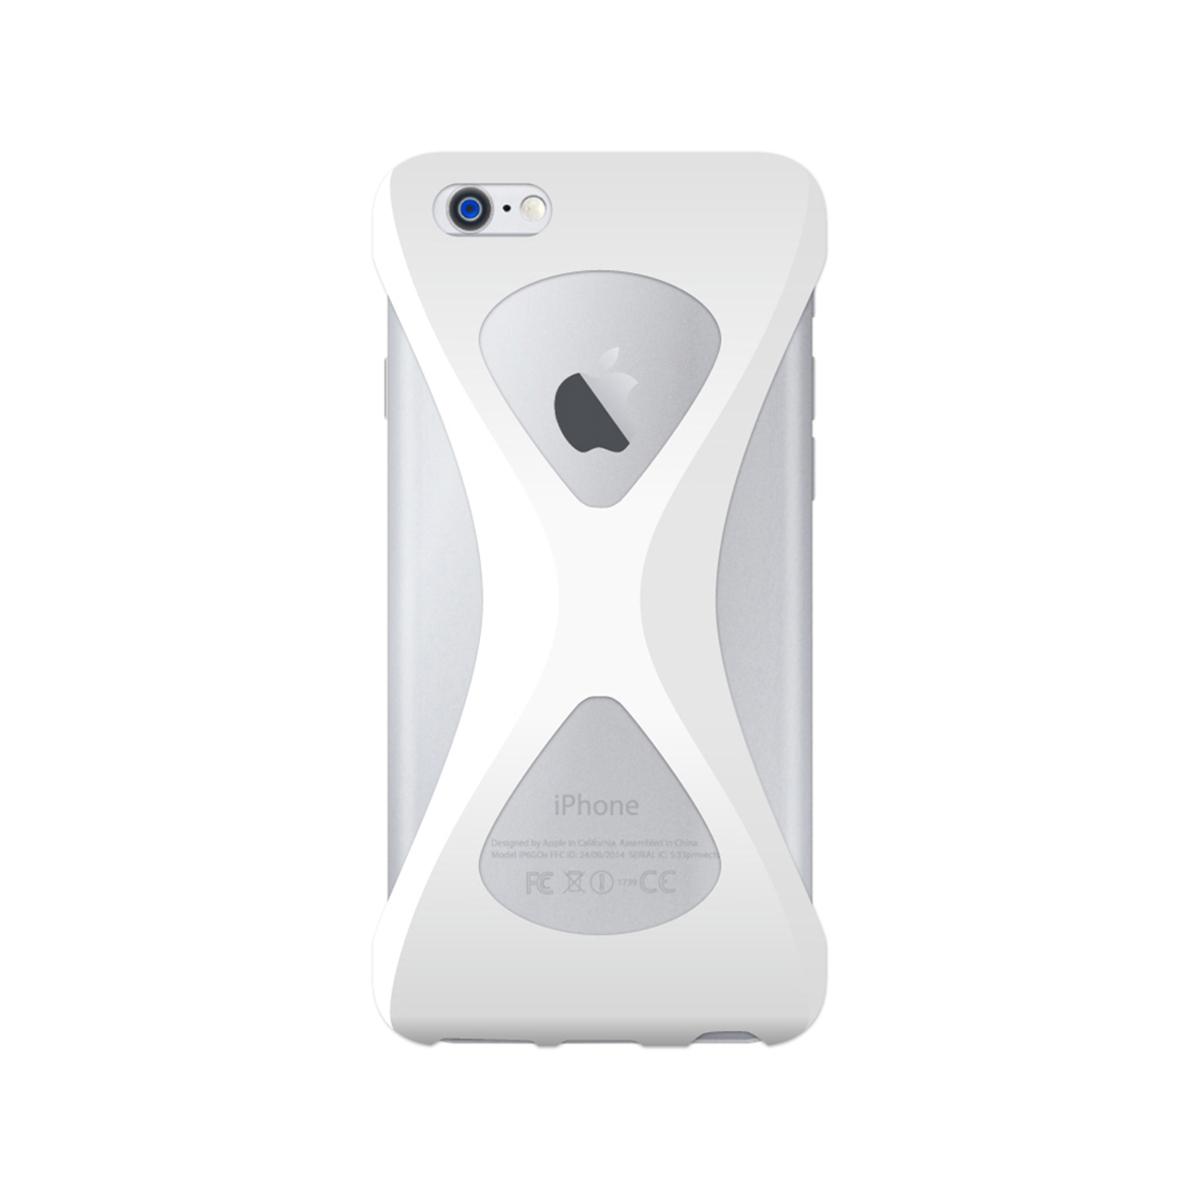 "iPhoneは、""指1本""で落とさない|iPhone 6 Plus /6s Plus 用 | iPhone は""指1本""で持つ – 落とす不安から解放され、操作の""自由度""が広がる iPhone カバー | Palmo for iPhone6 Plus / iPhone 6s Plus"